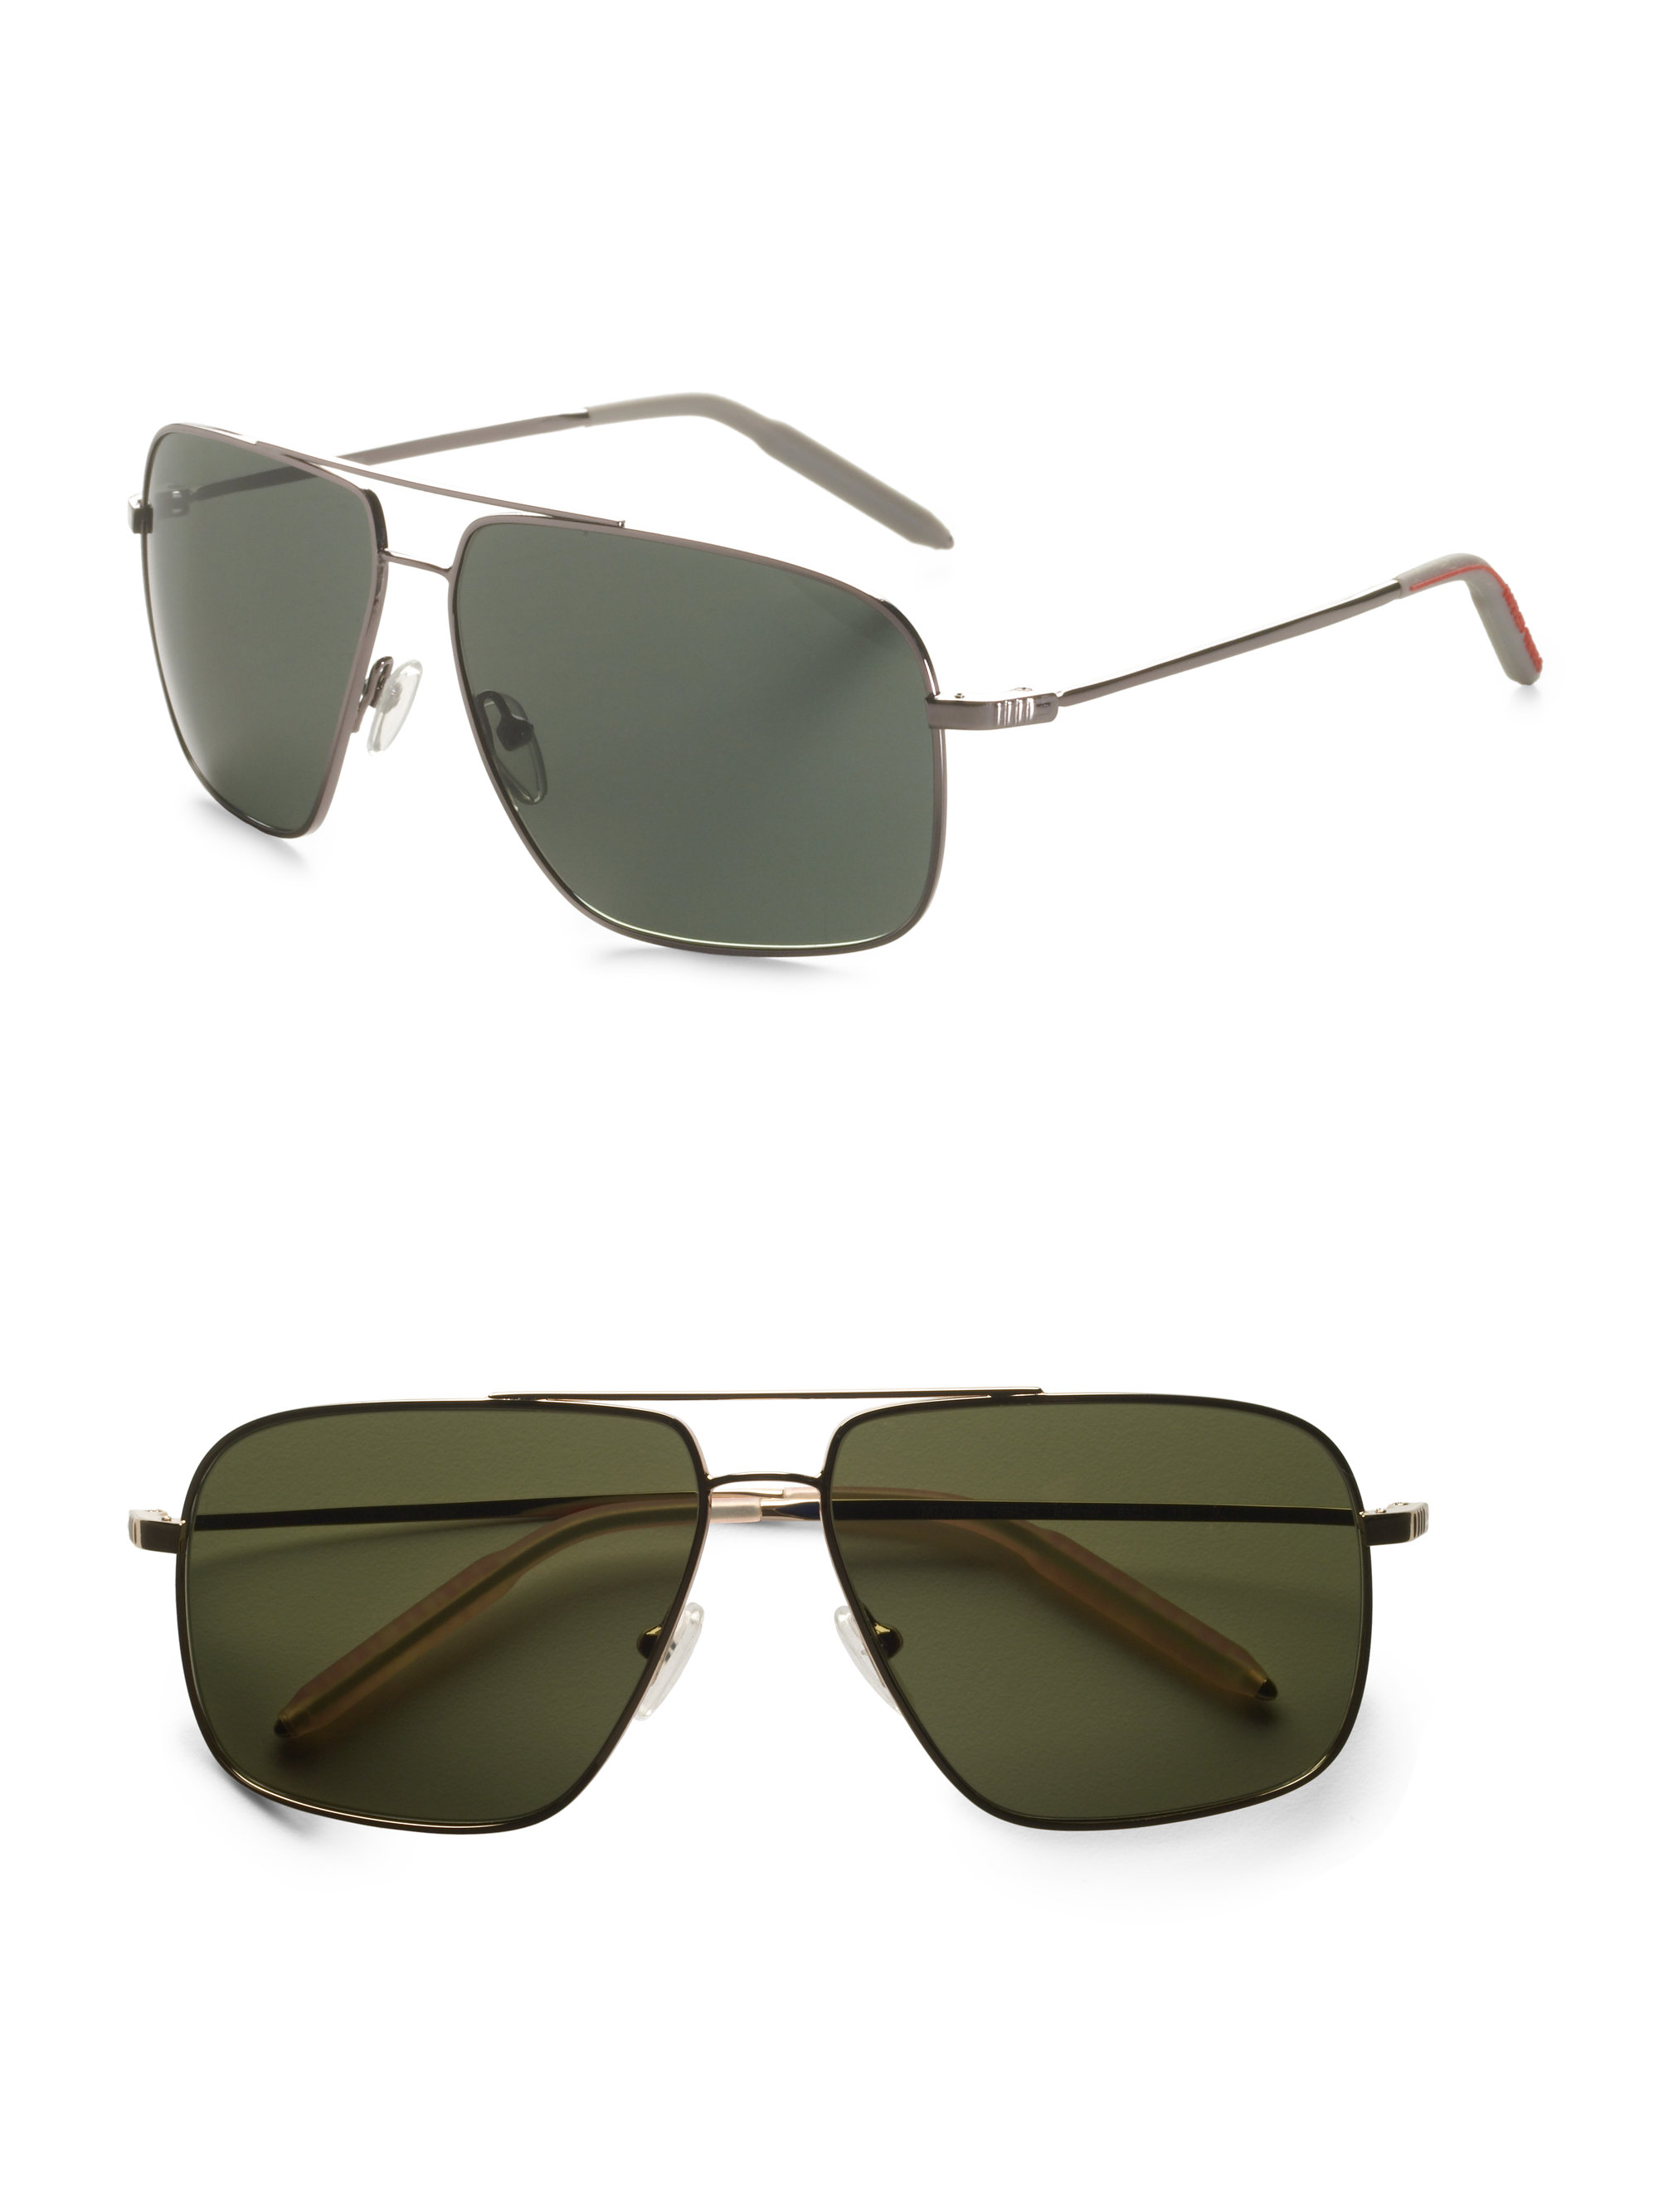 312f9b651ba0c Mosley Tribes Enforcer Aviator Sunglasses in Gray - Lyst